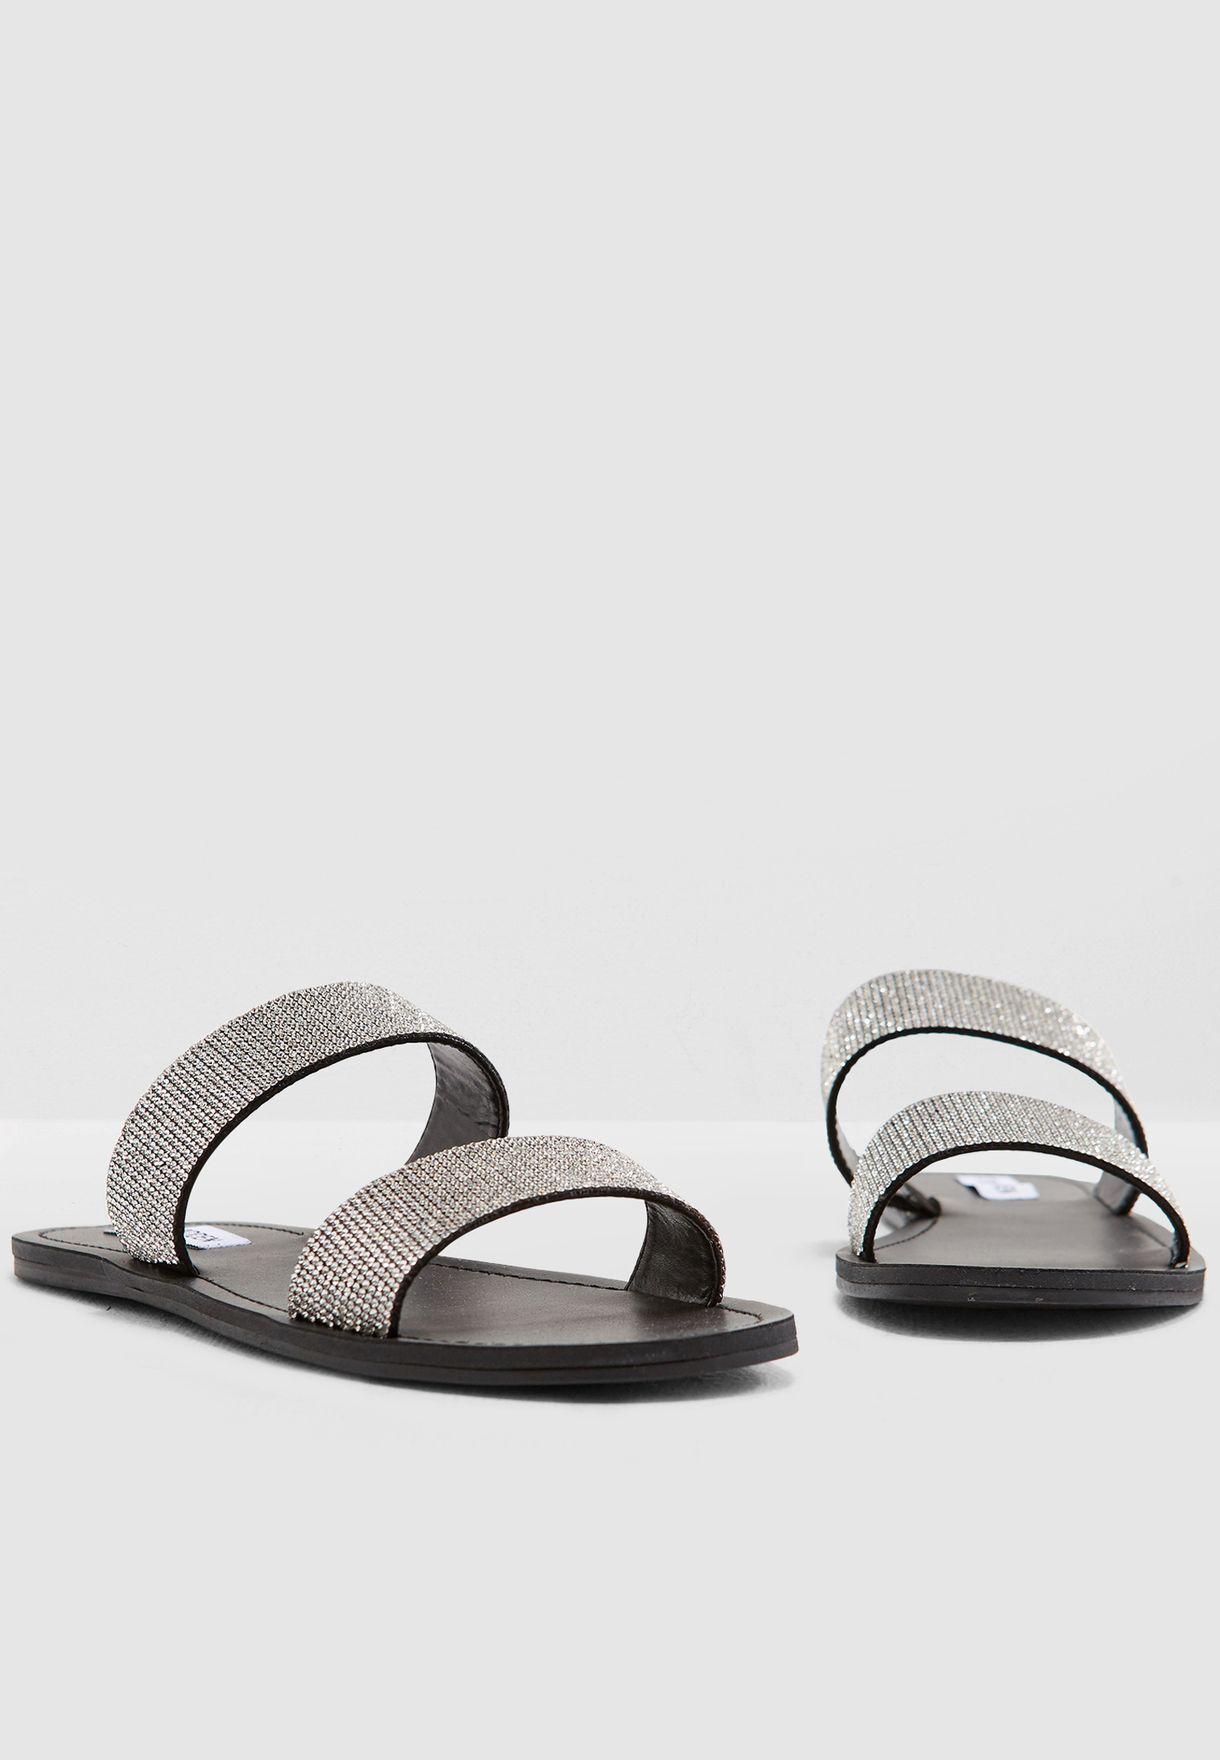 1f92a3541999 Shop Steve Madden black Rage Flat Sandal RAGE for Women in Qatar ...